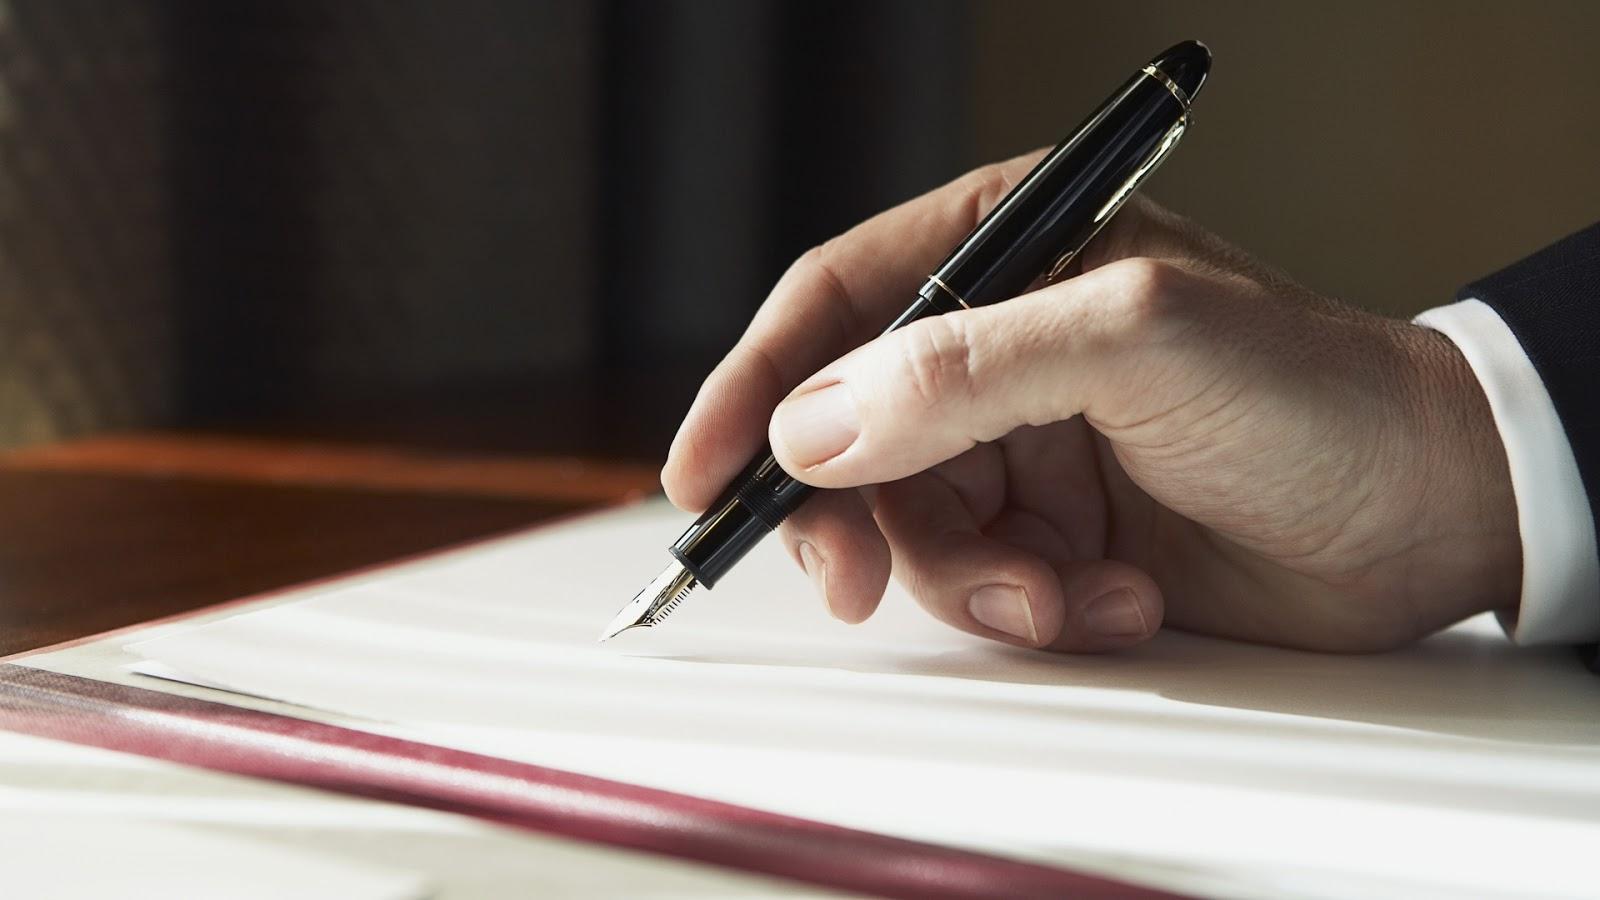 Bagaimana Hukum Membuat Fiksi Demi Mendapatkan Bayaran Tinggi